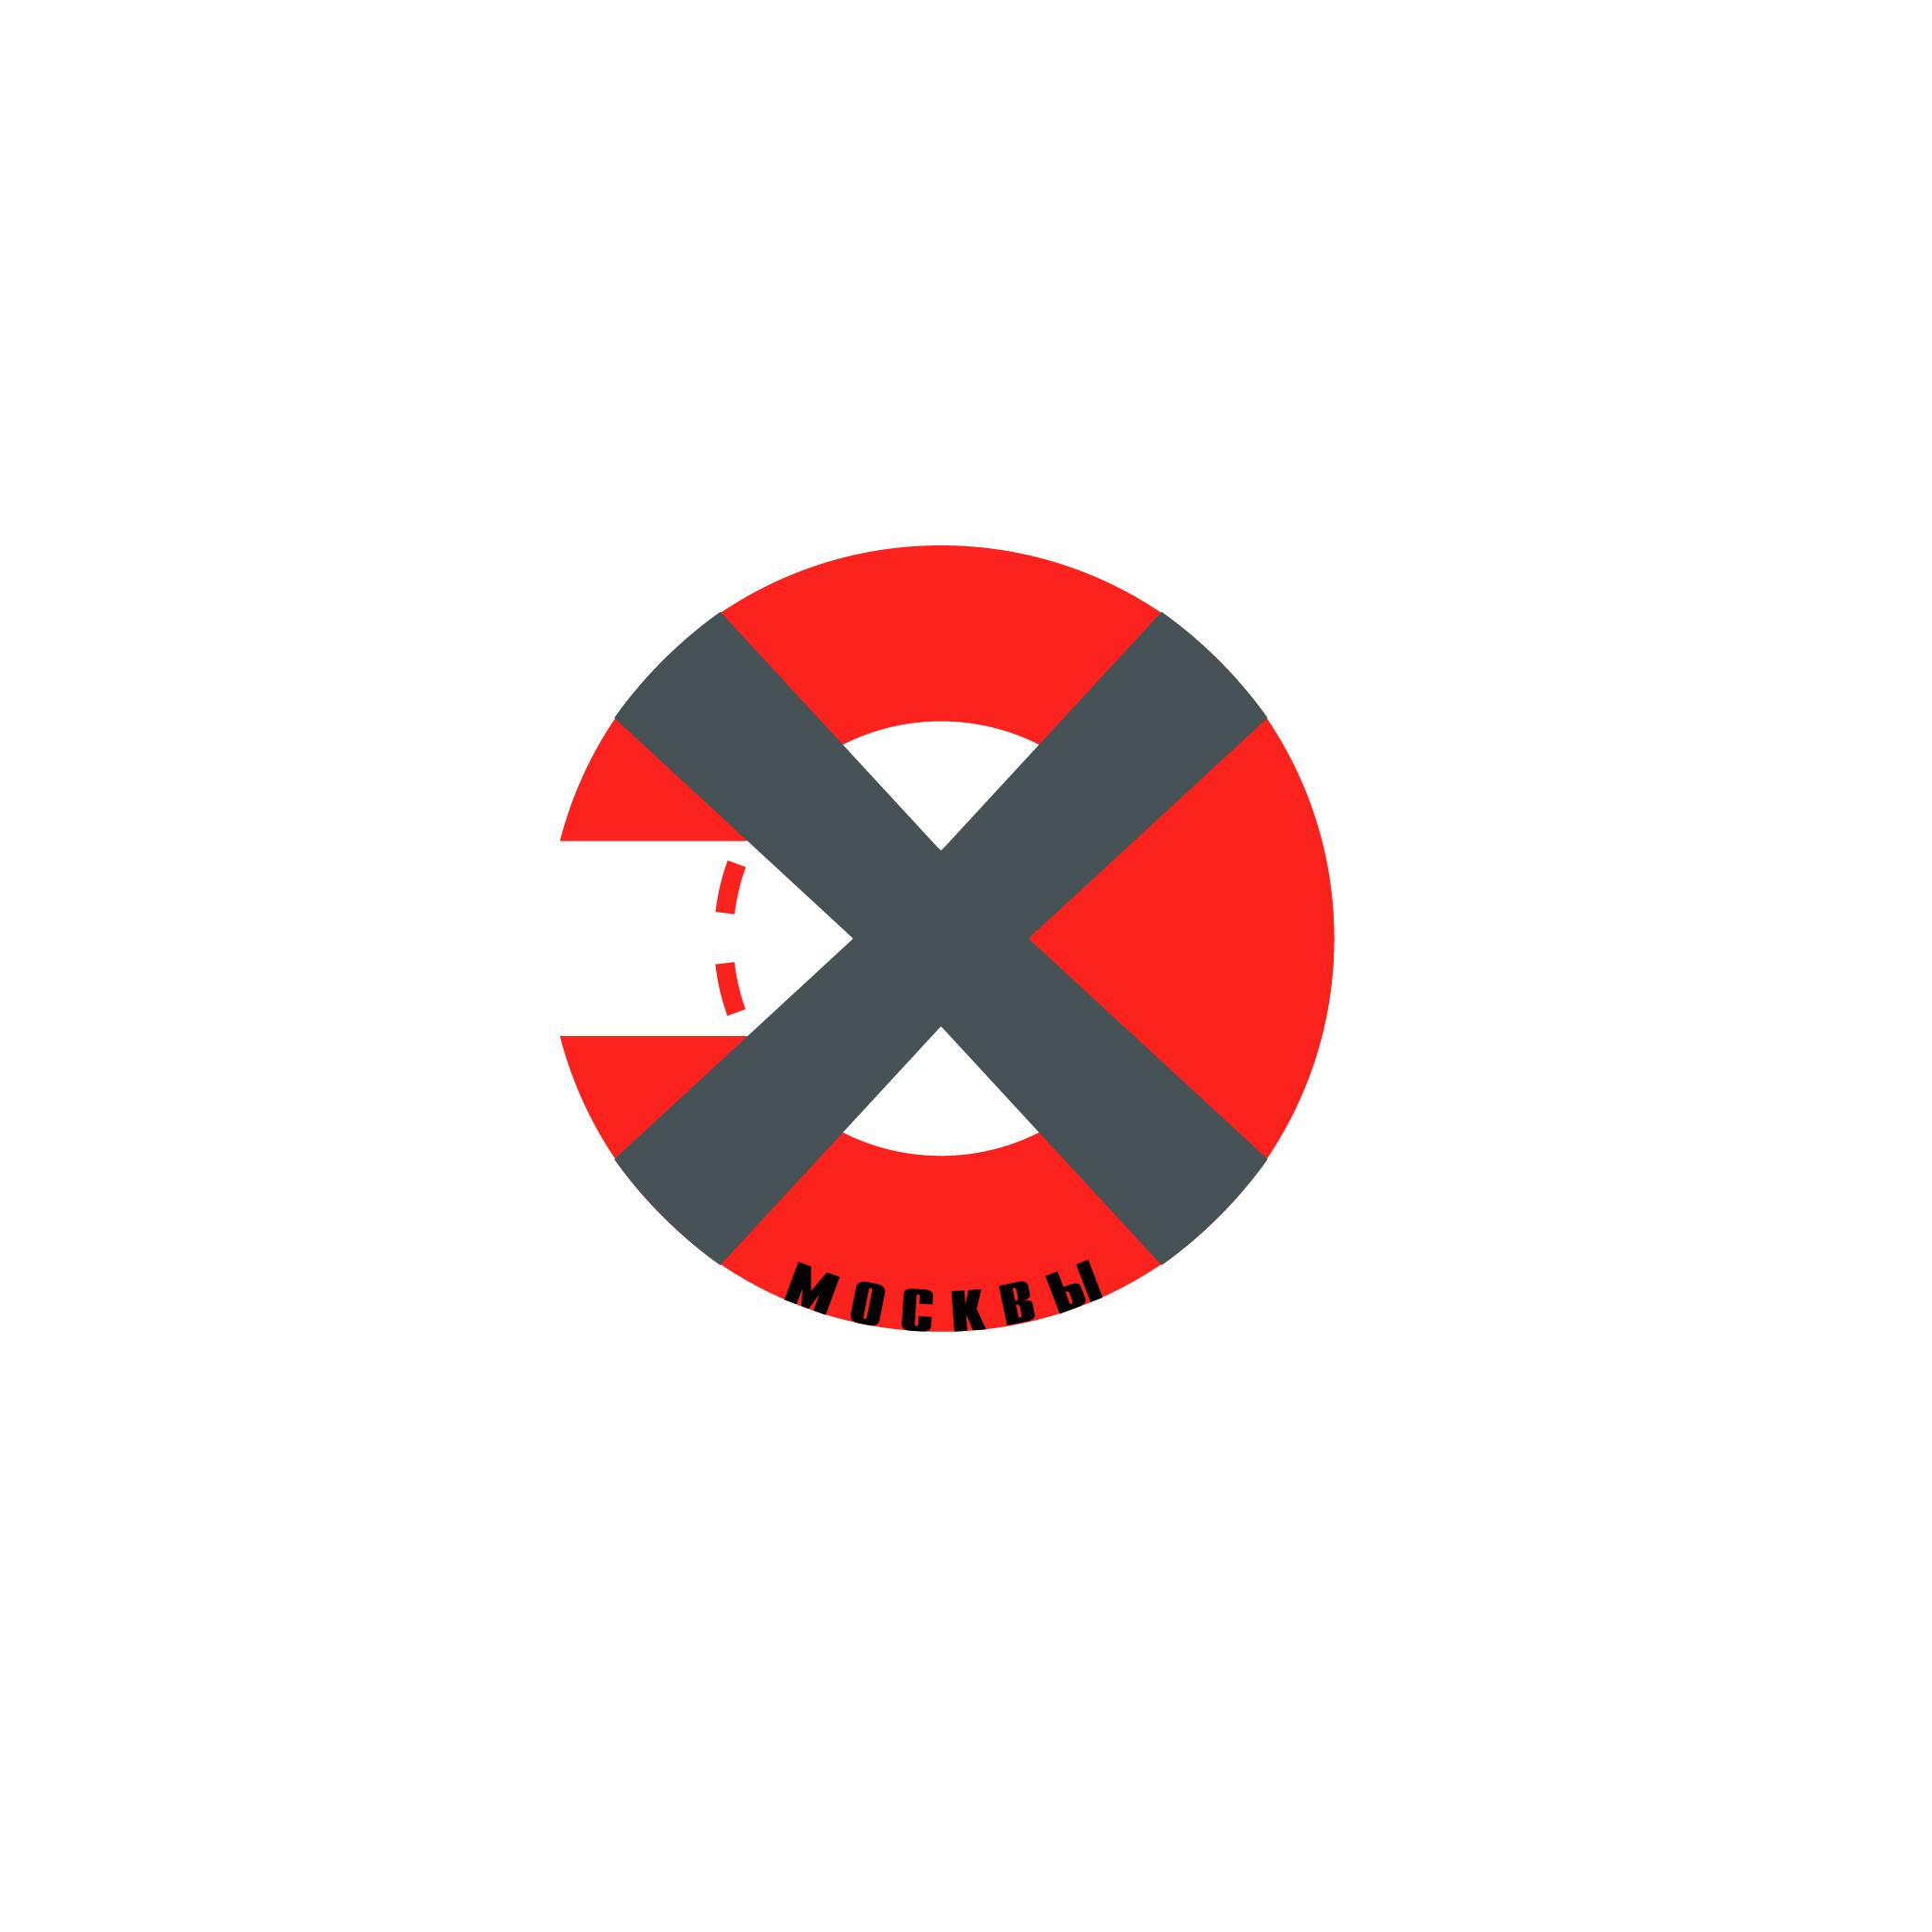 Дизайн логотипа р/с Эхо Москвы. фото f_0075627158bb8956.jpg